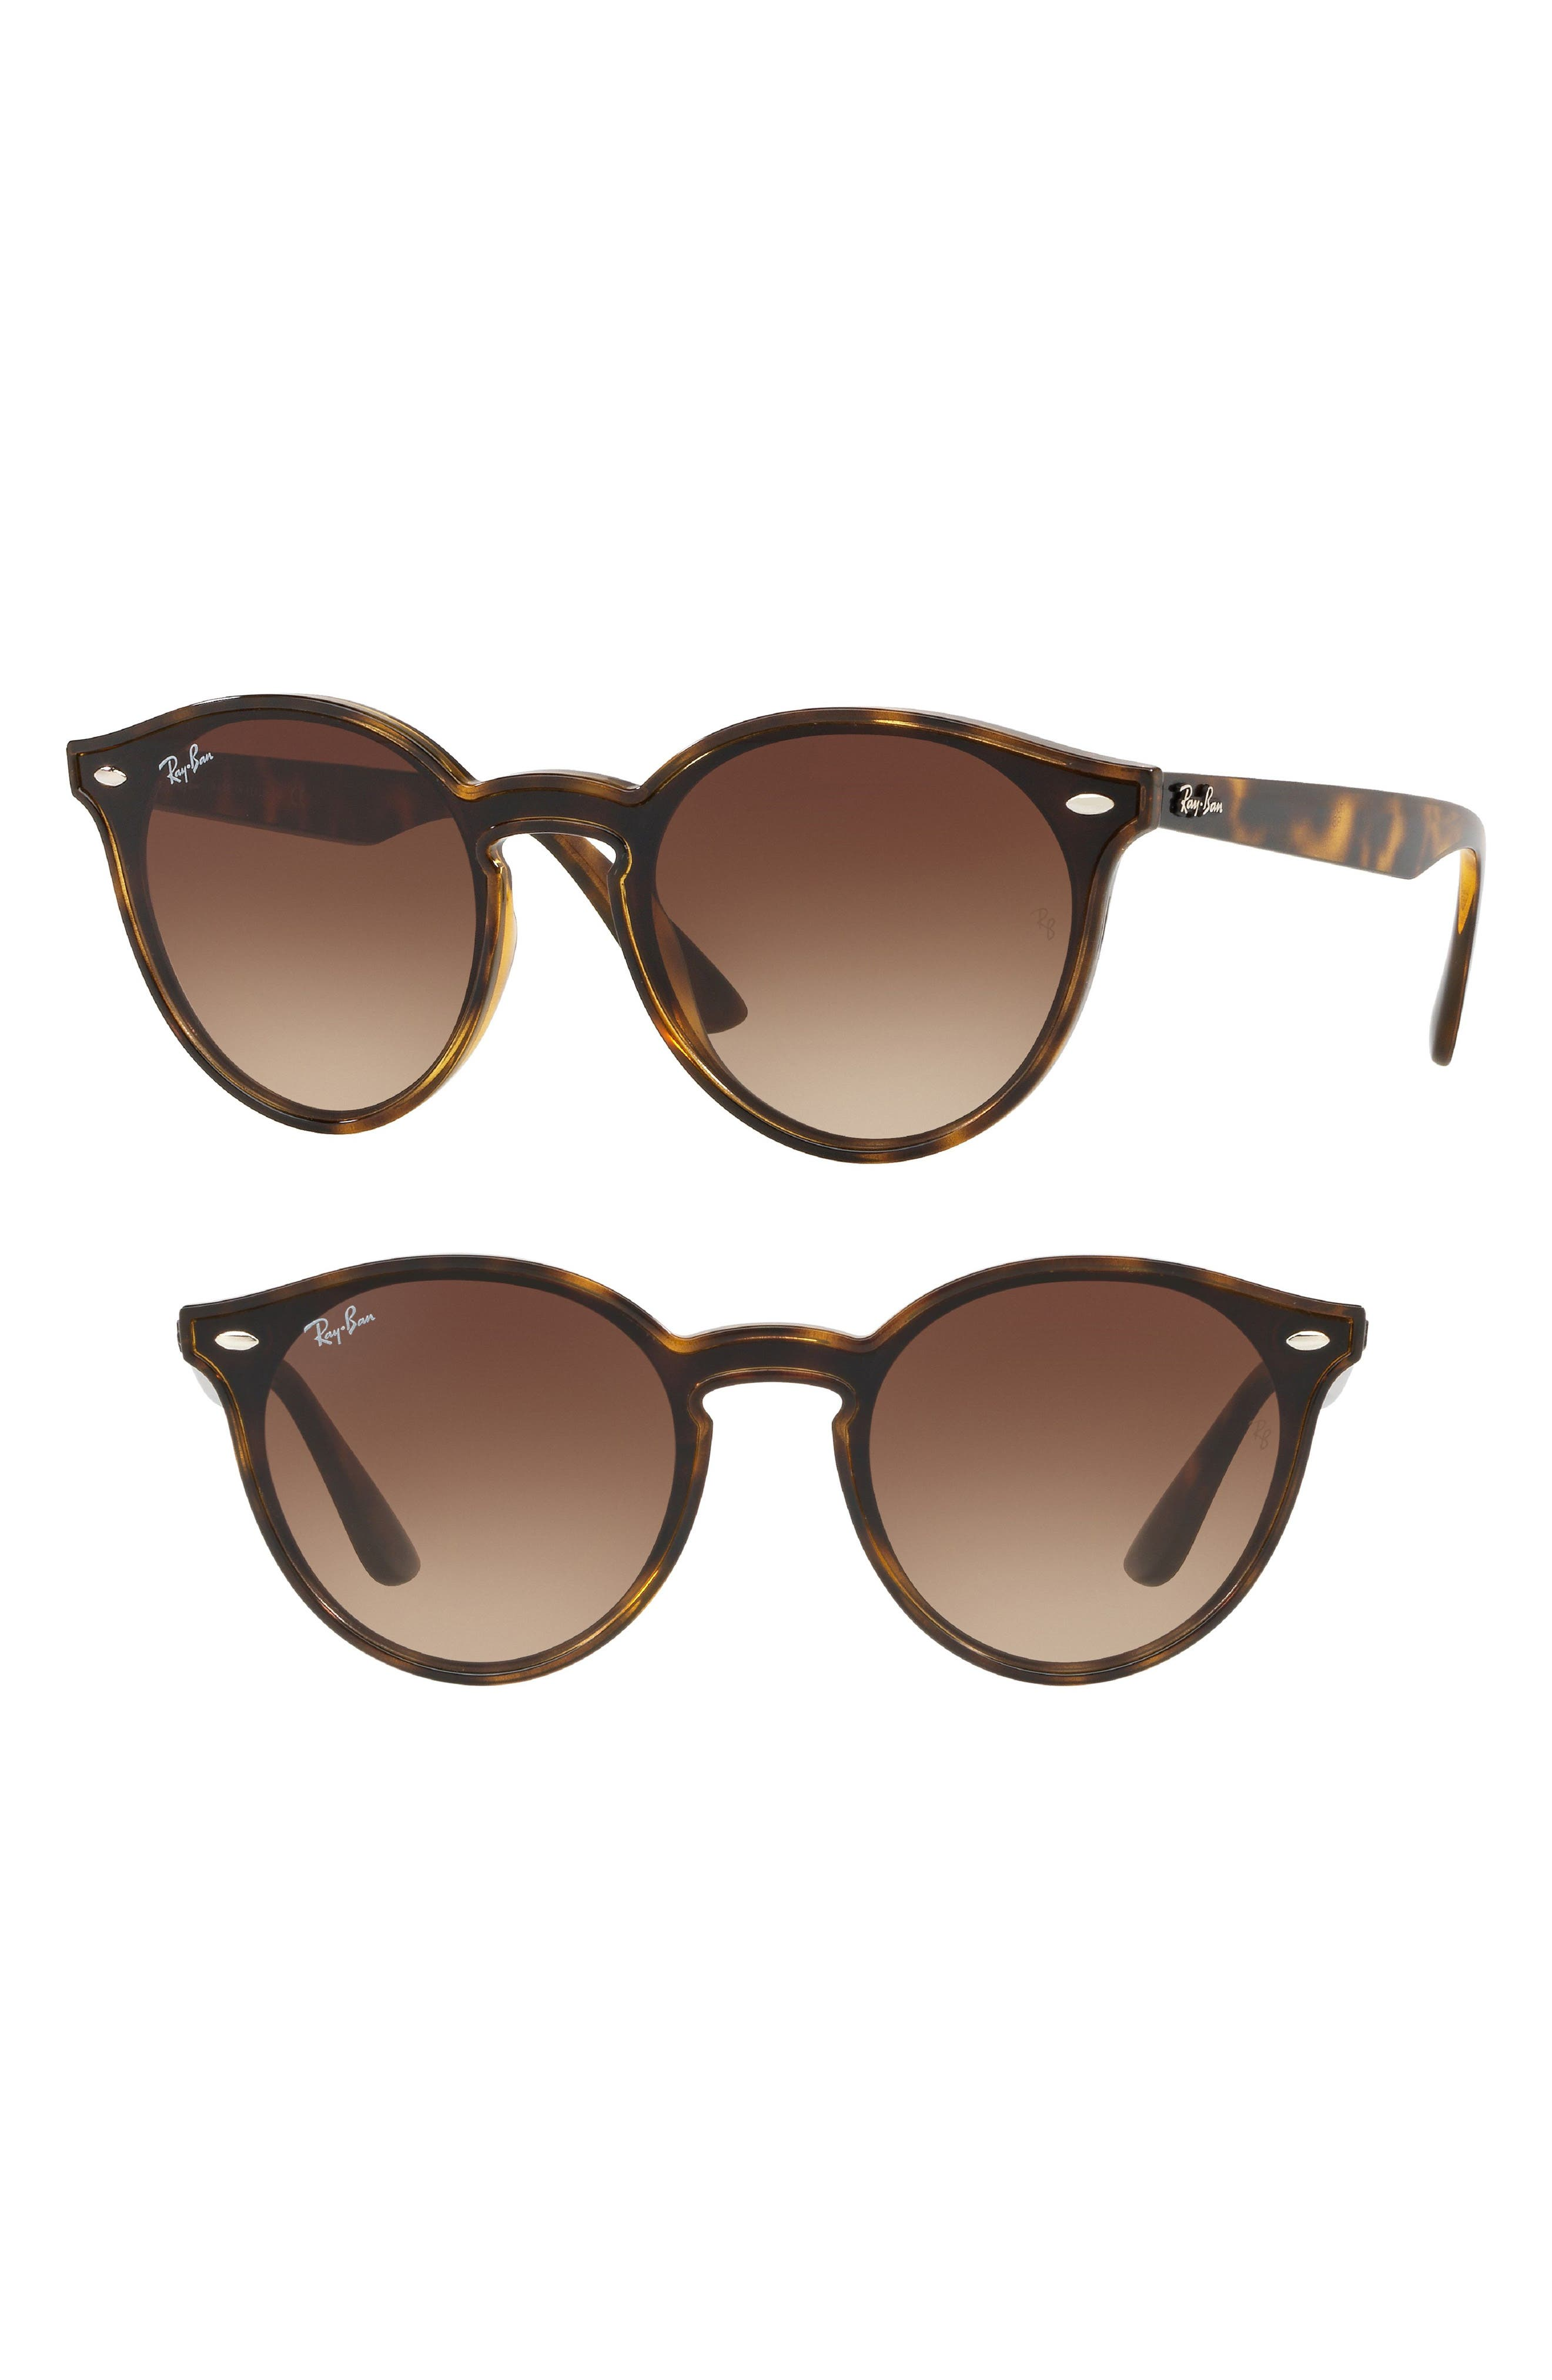 Ray-Ban Blaze 37Mm Round Sunglasses - Light Havana Gradient